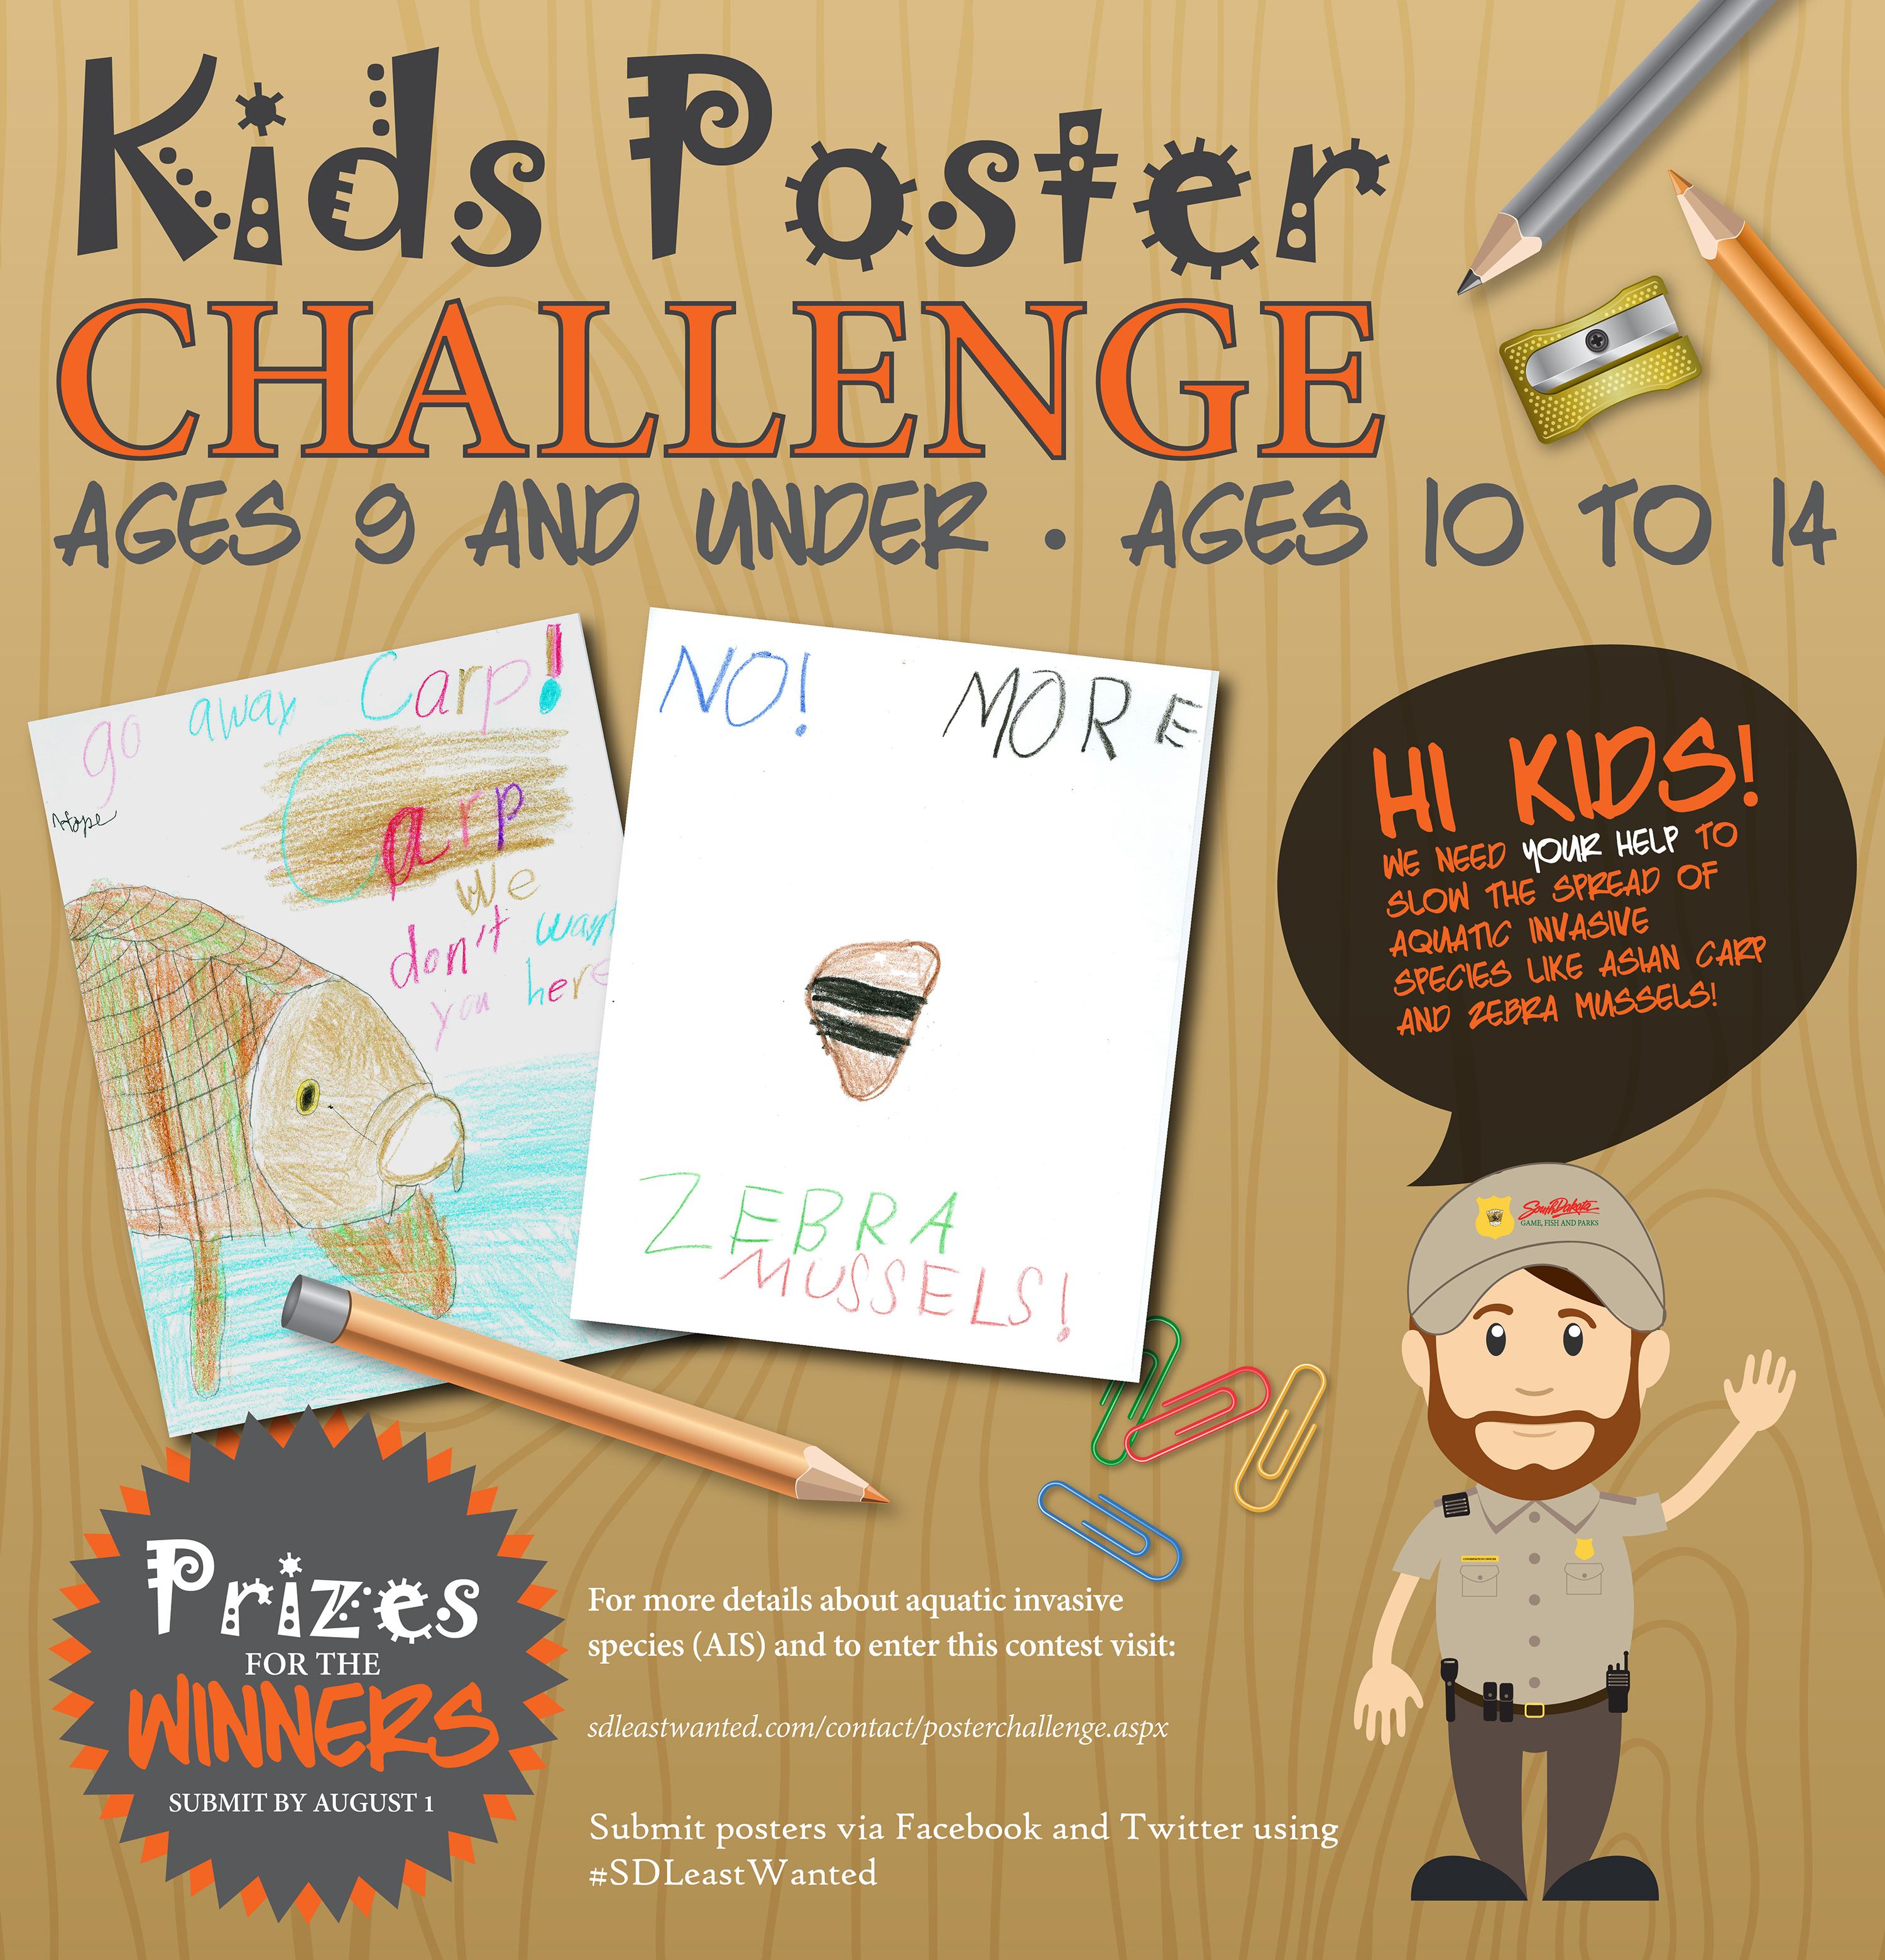 KidsPosterChallenge.jpg